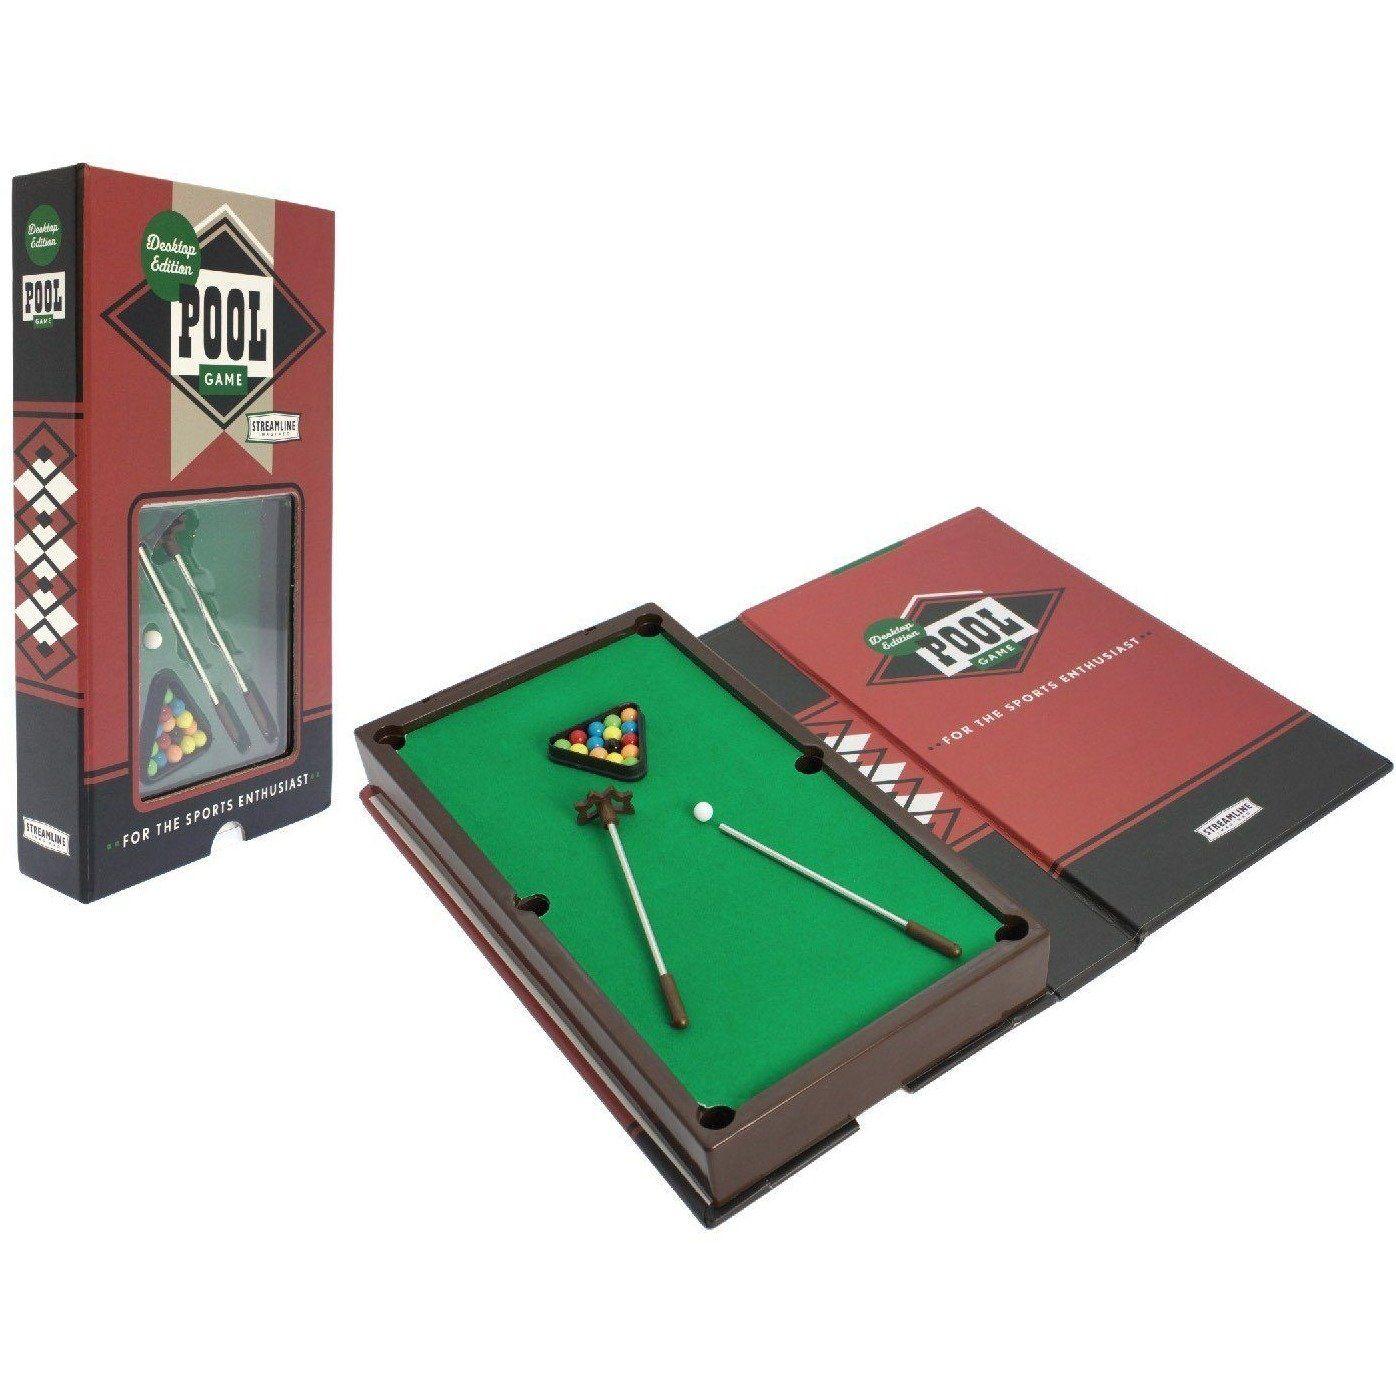 Desktop Edition Pool Game Pool games, Mini pool table, Pool